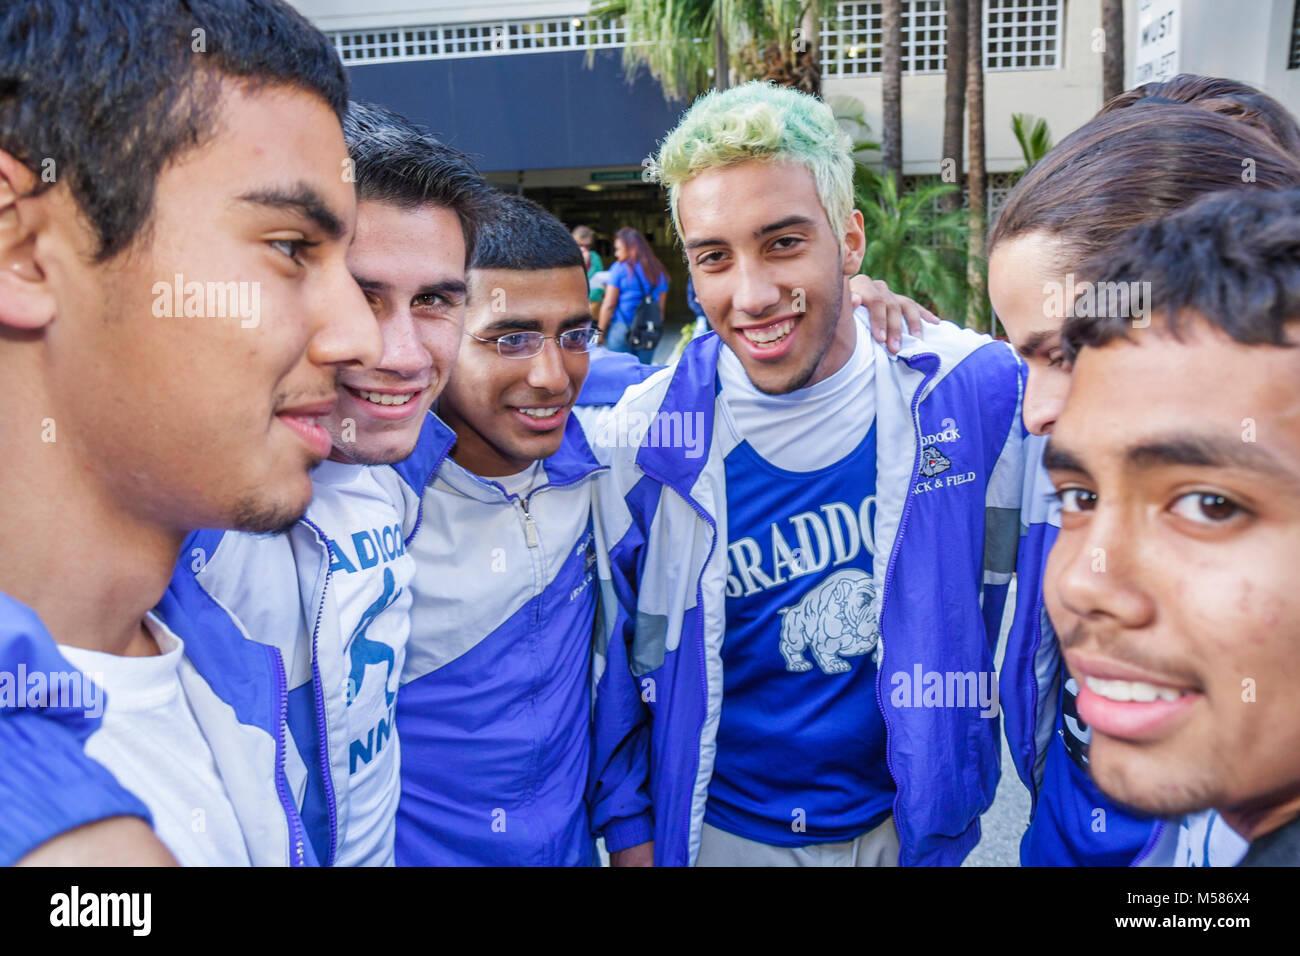 Carnaval 8K Run preparation community event student Braddock High School track team members teen boys - Stock Image